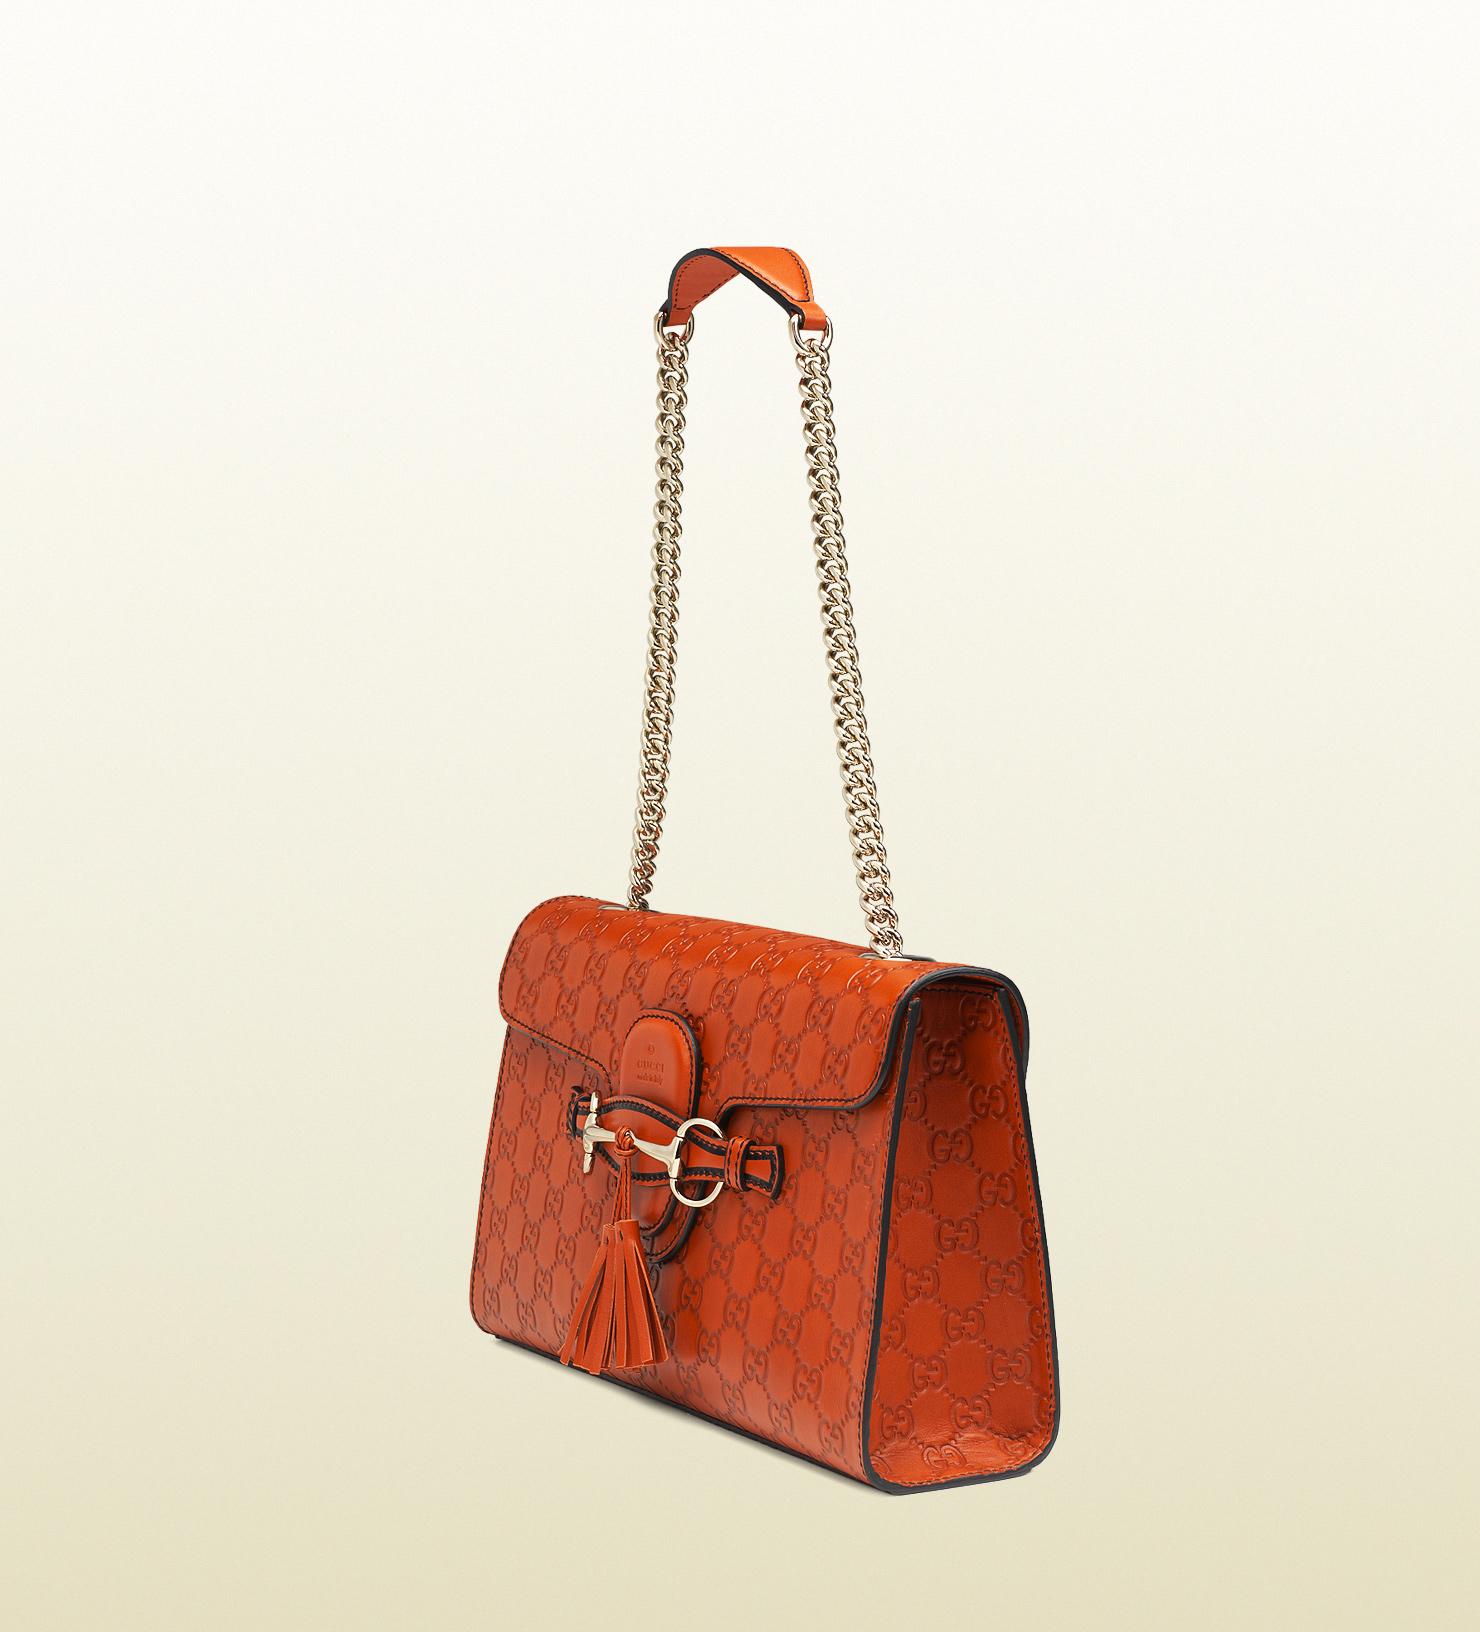 2ce3391b739 Gucci Emily Guccissima Chain Shoulder Bag in Orange - Lyst